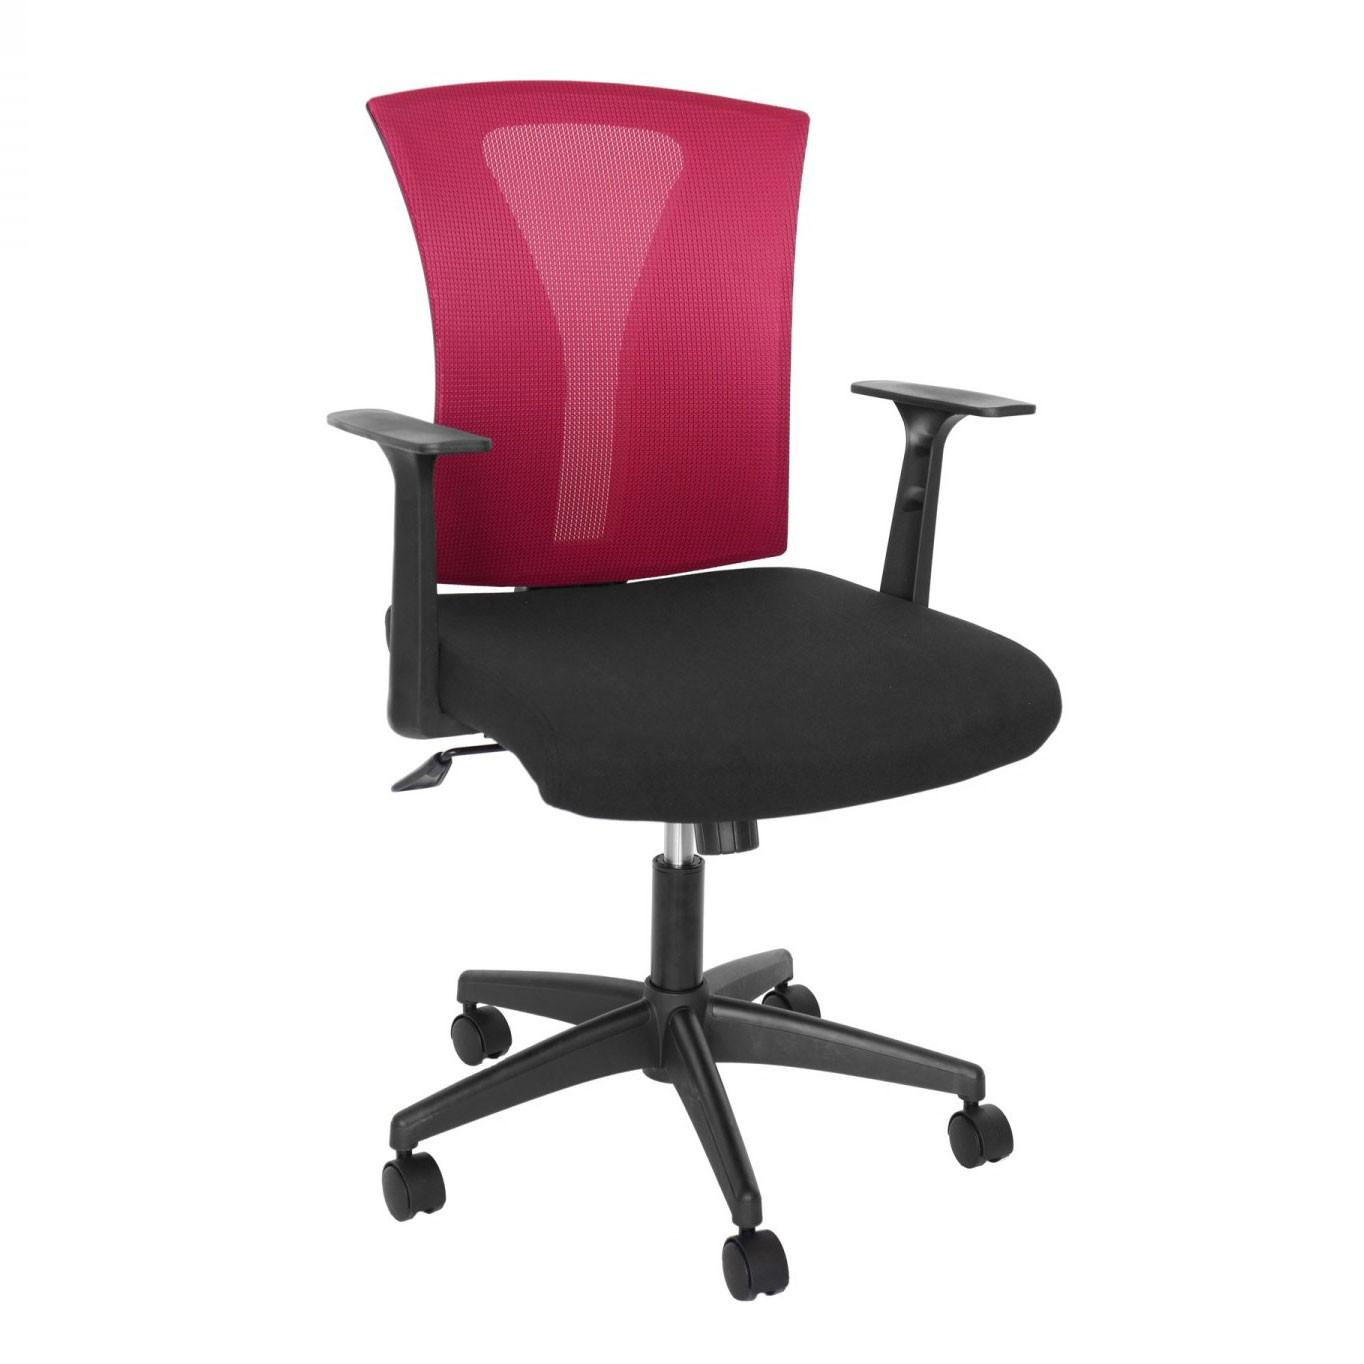 Scaun birou ergonomic Vector, rotativ, mesh + material textil, bordo + negru